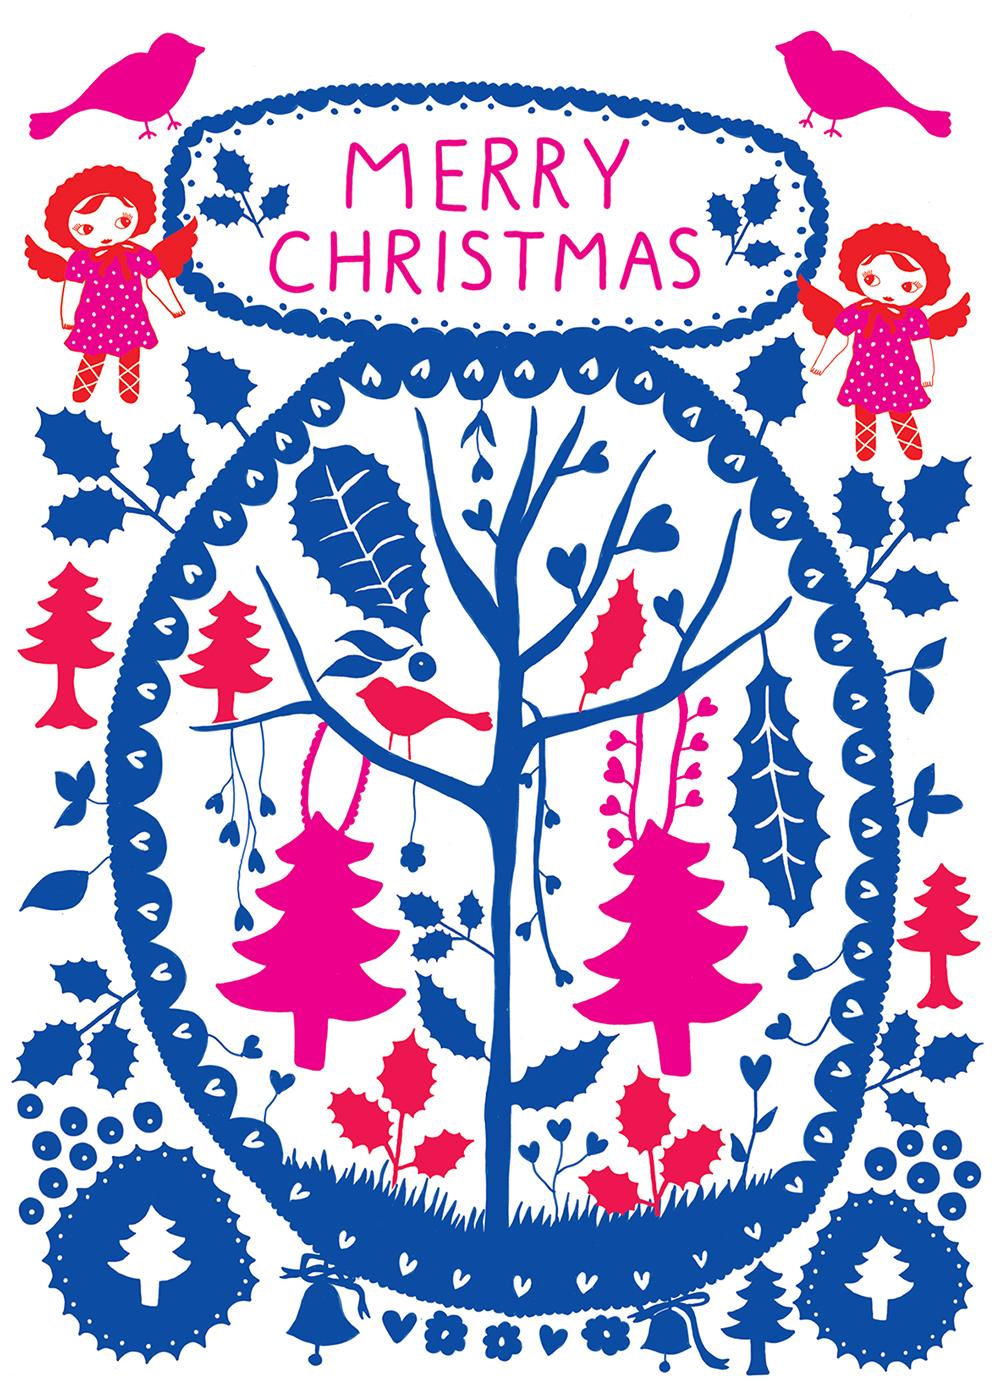 Flow Christmas card by Marenthe.jpg